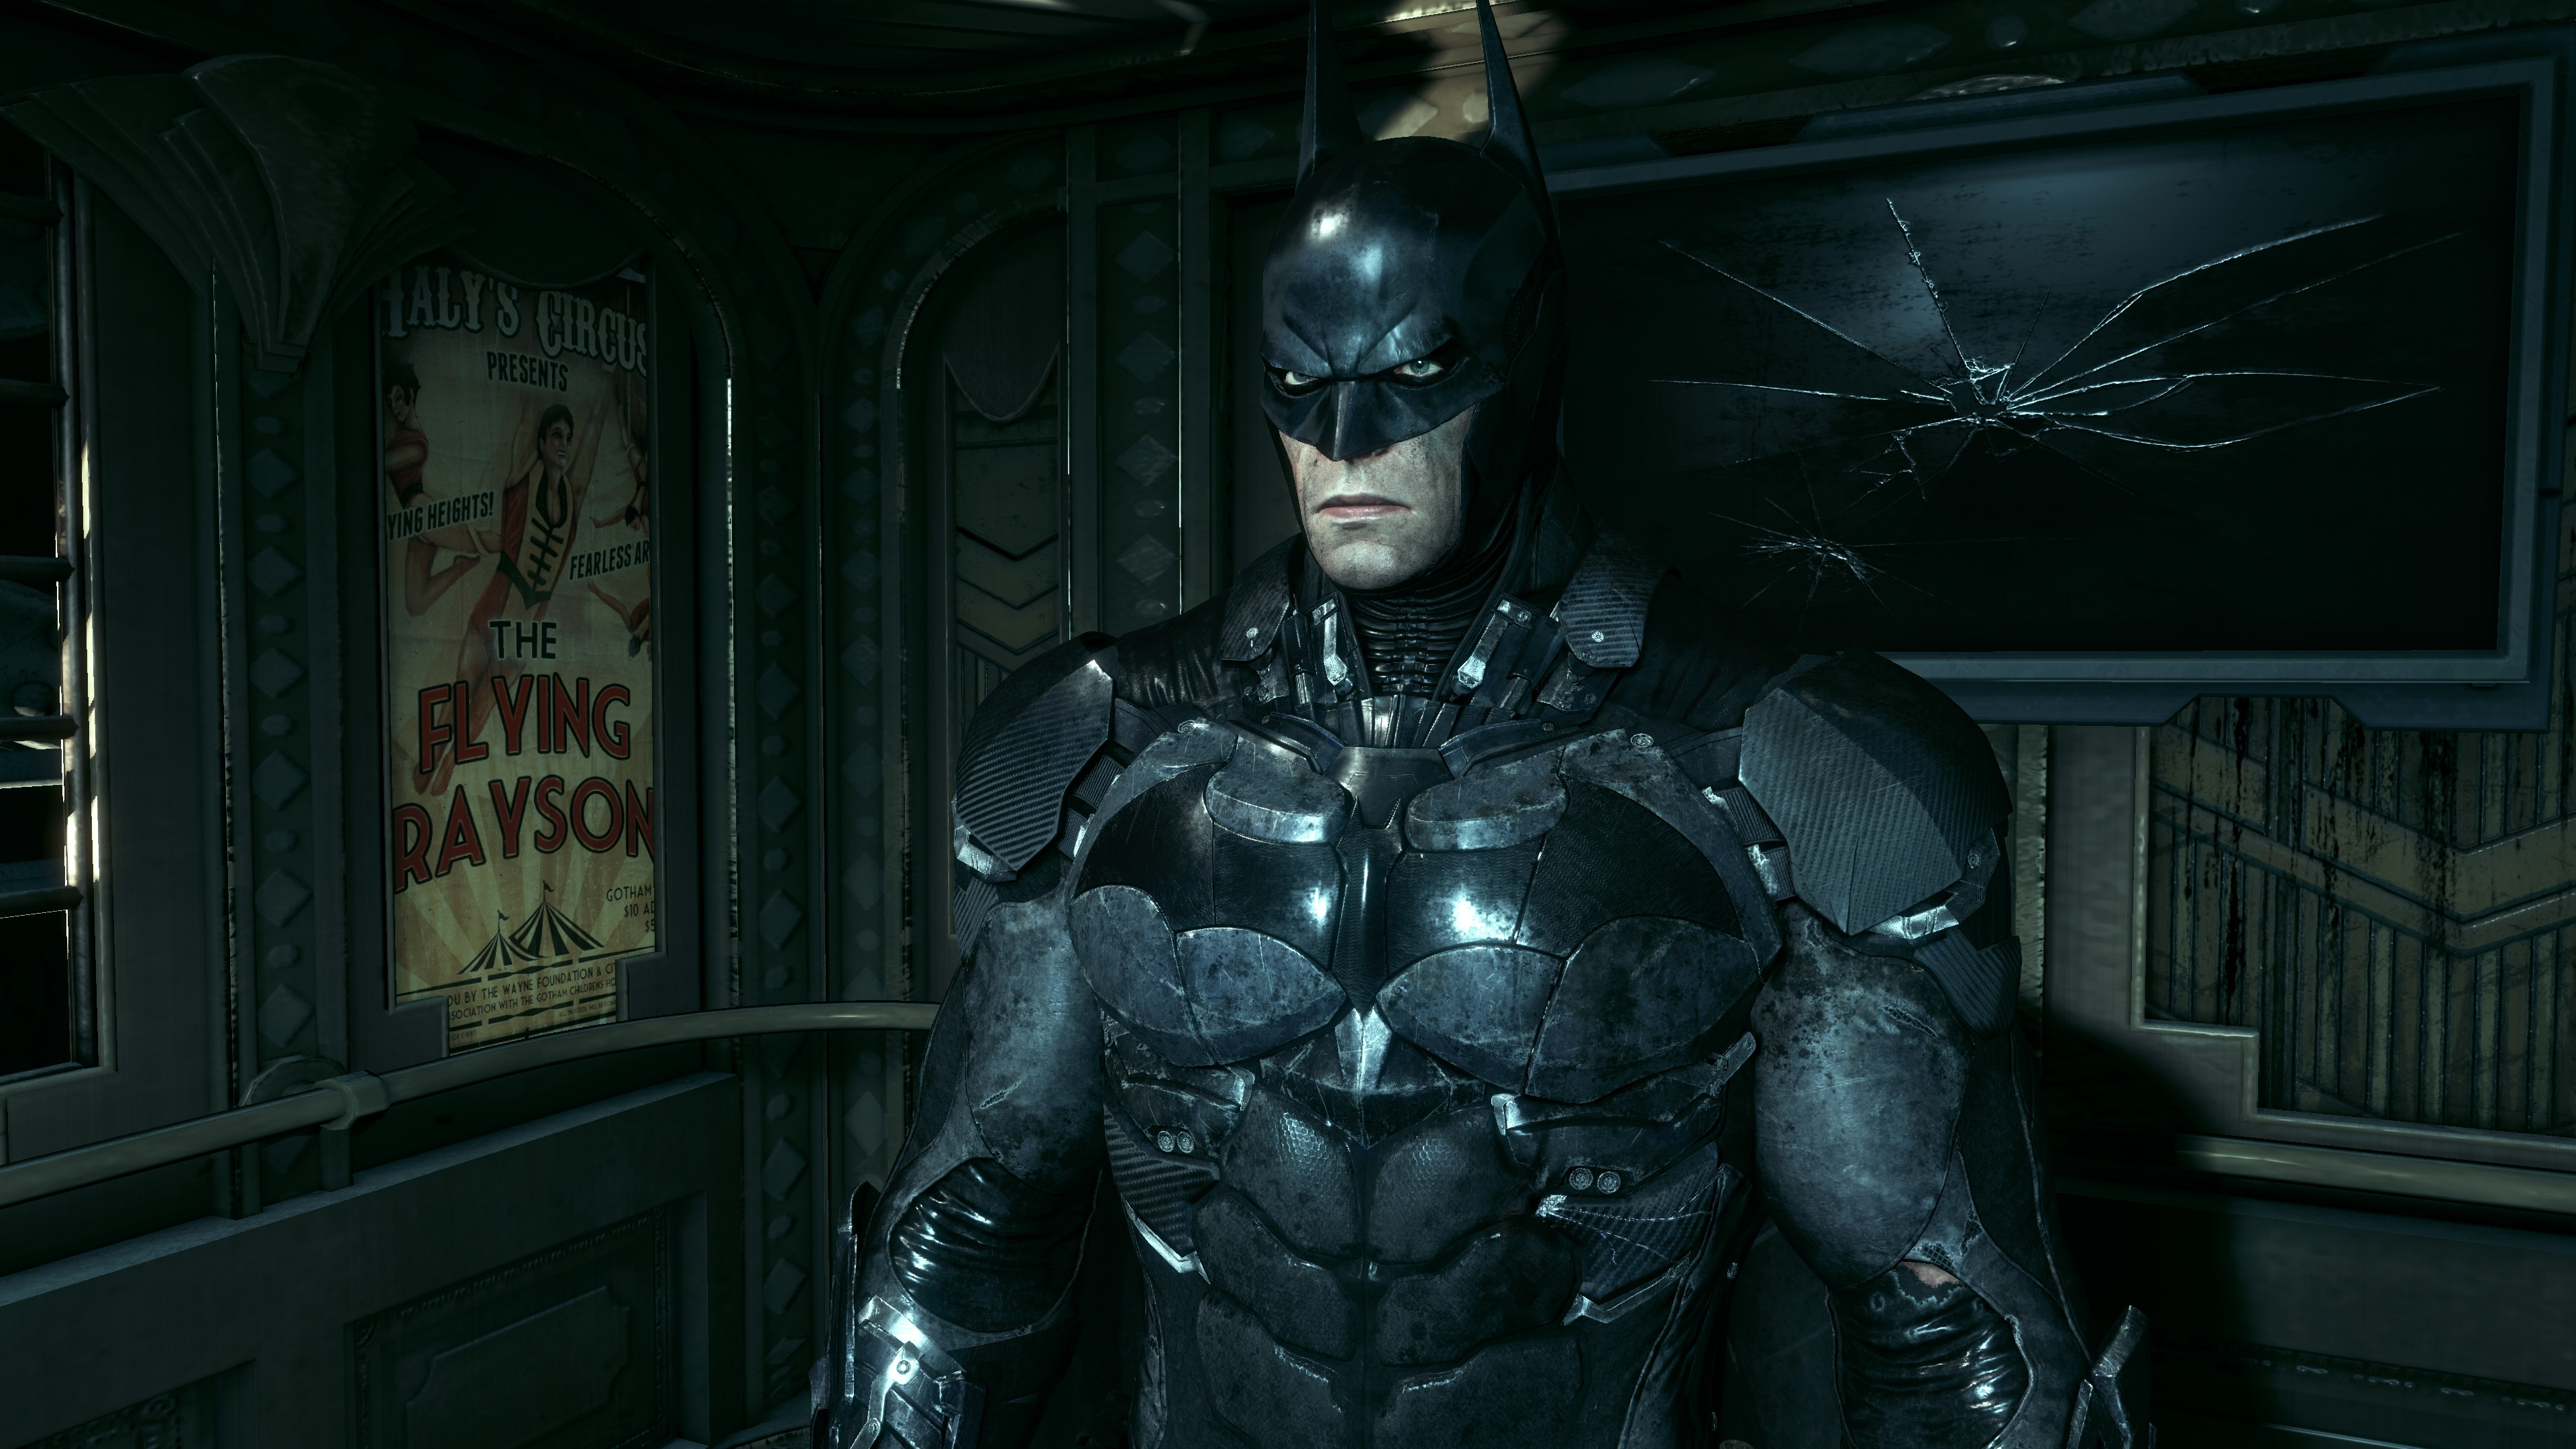 Batman Arkham Knight 4k Ultra Hd Wallpaper Background